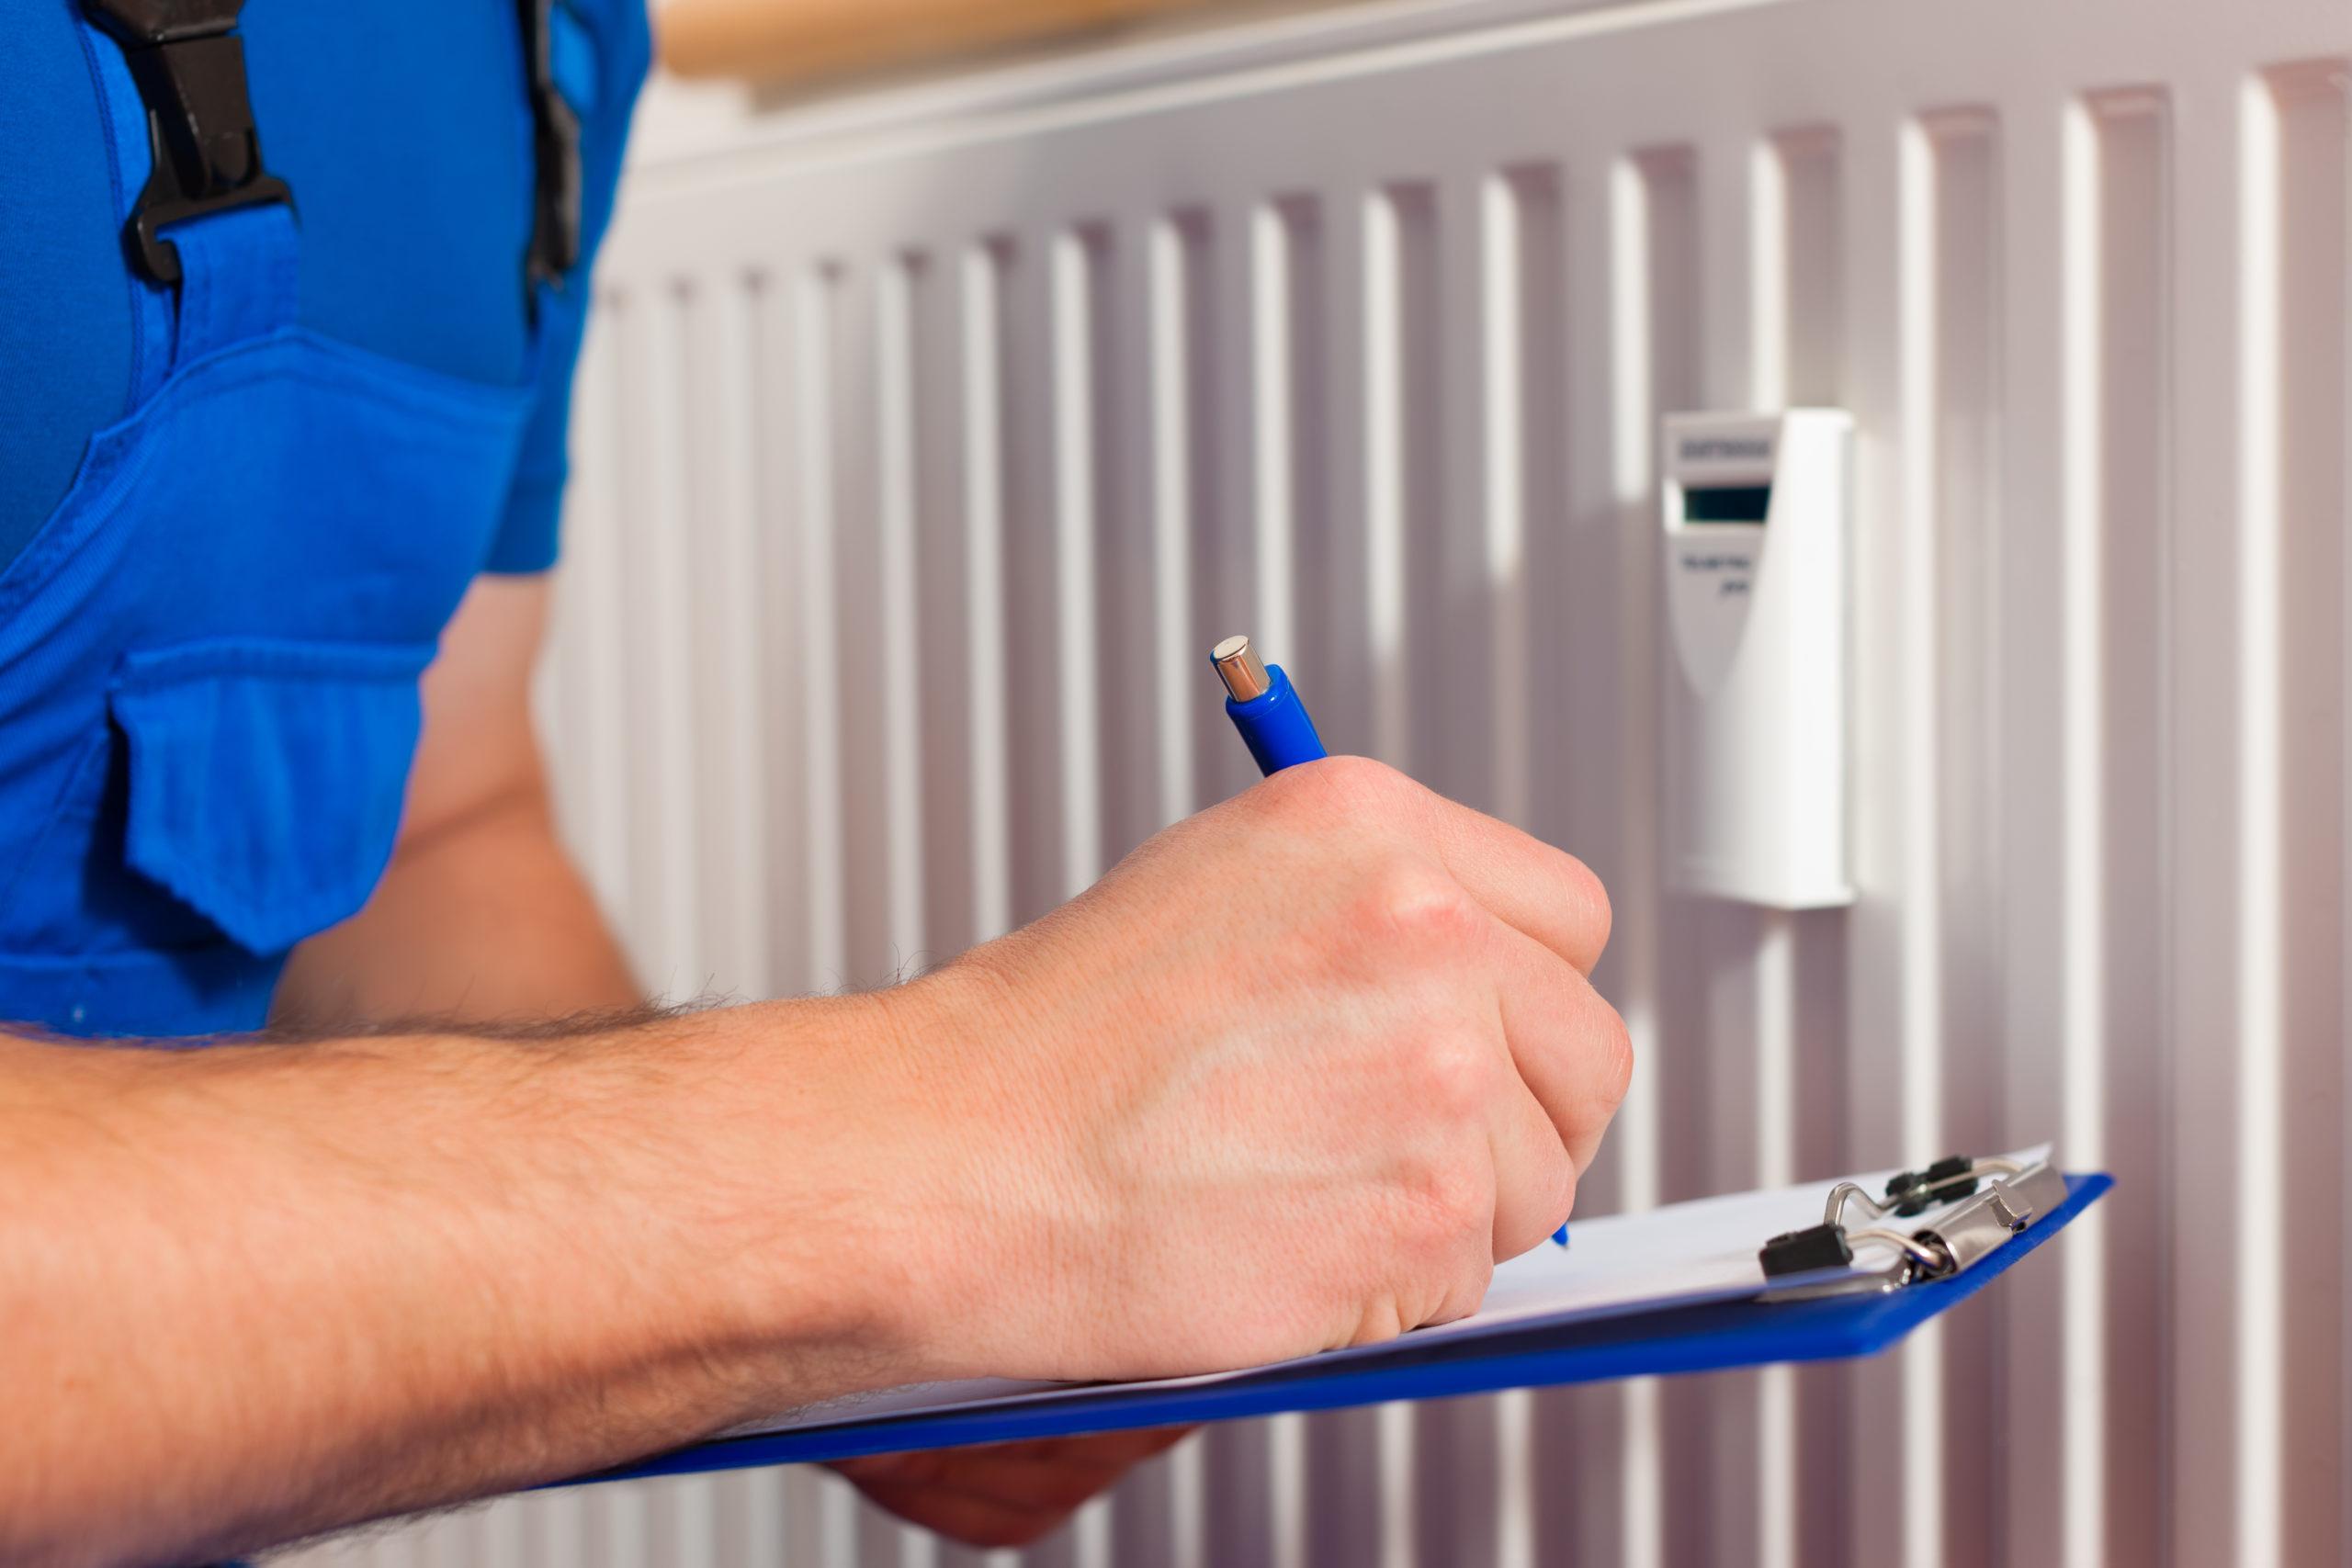 technician reading the heat meter on a heater